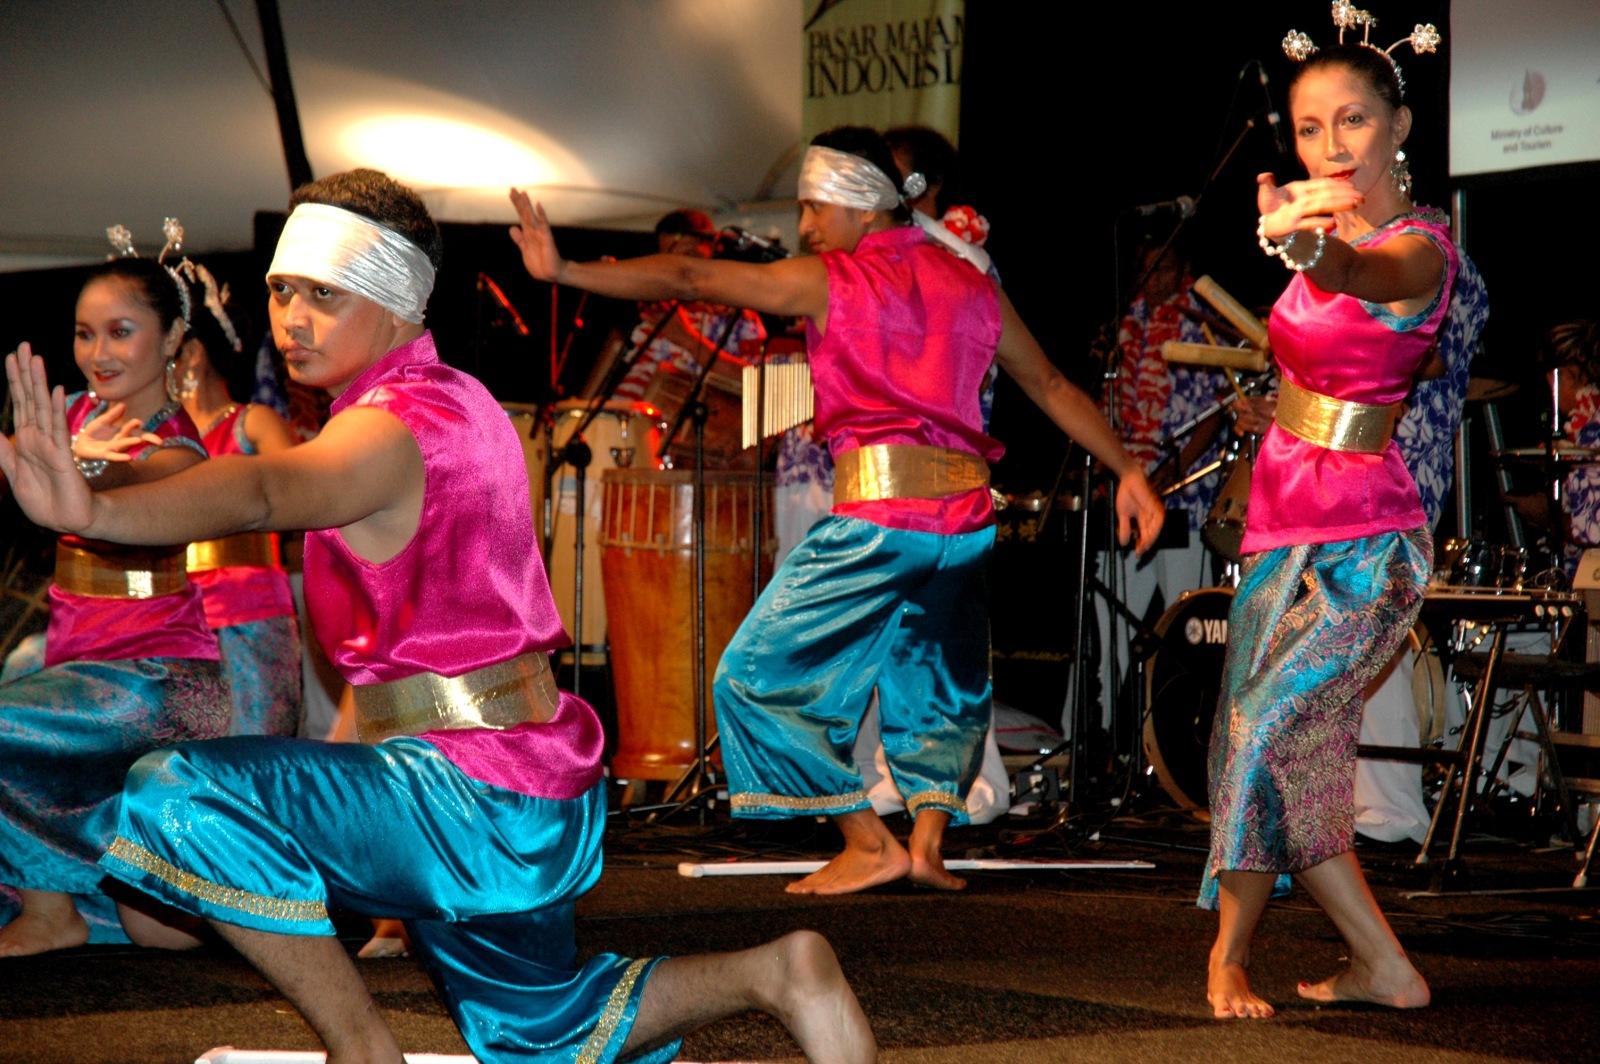 Pasar Malam Indonesia (beeldrep)